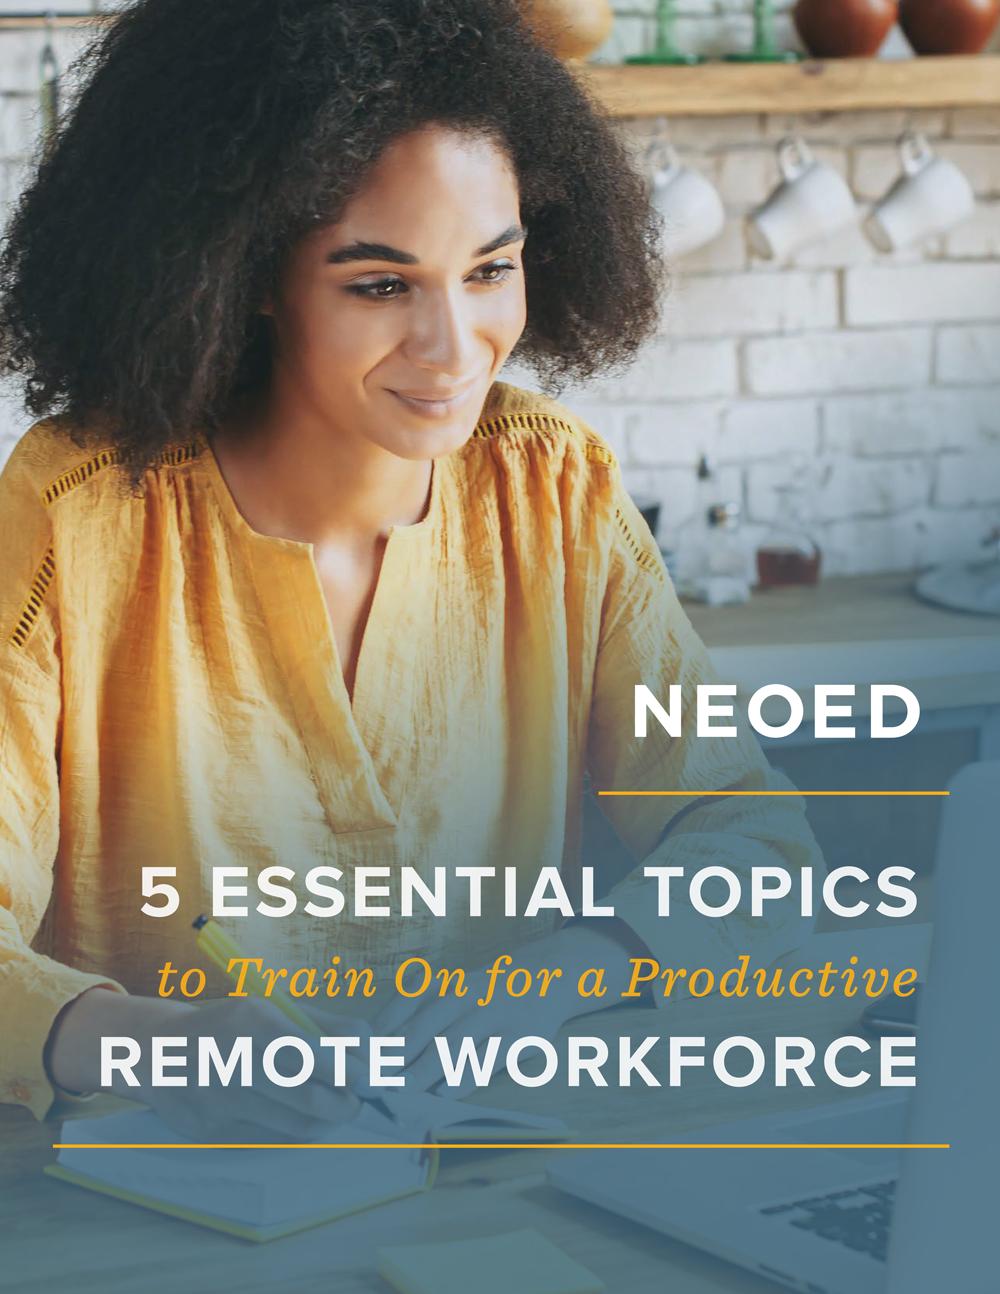 NEOED 5 Training Topics Remote Workforce